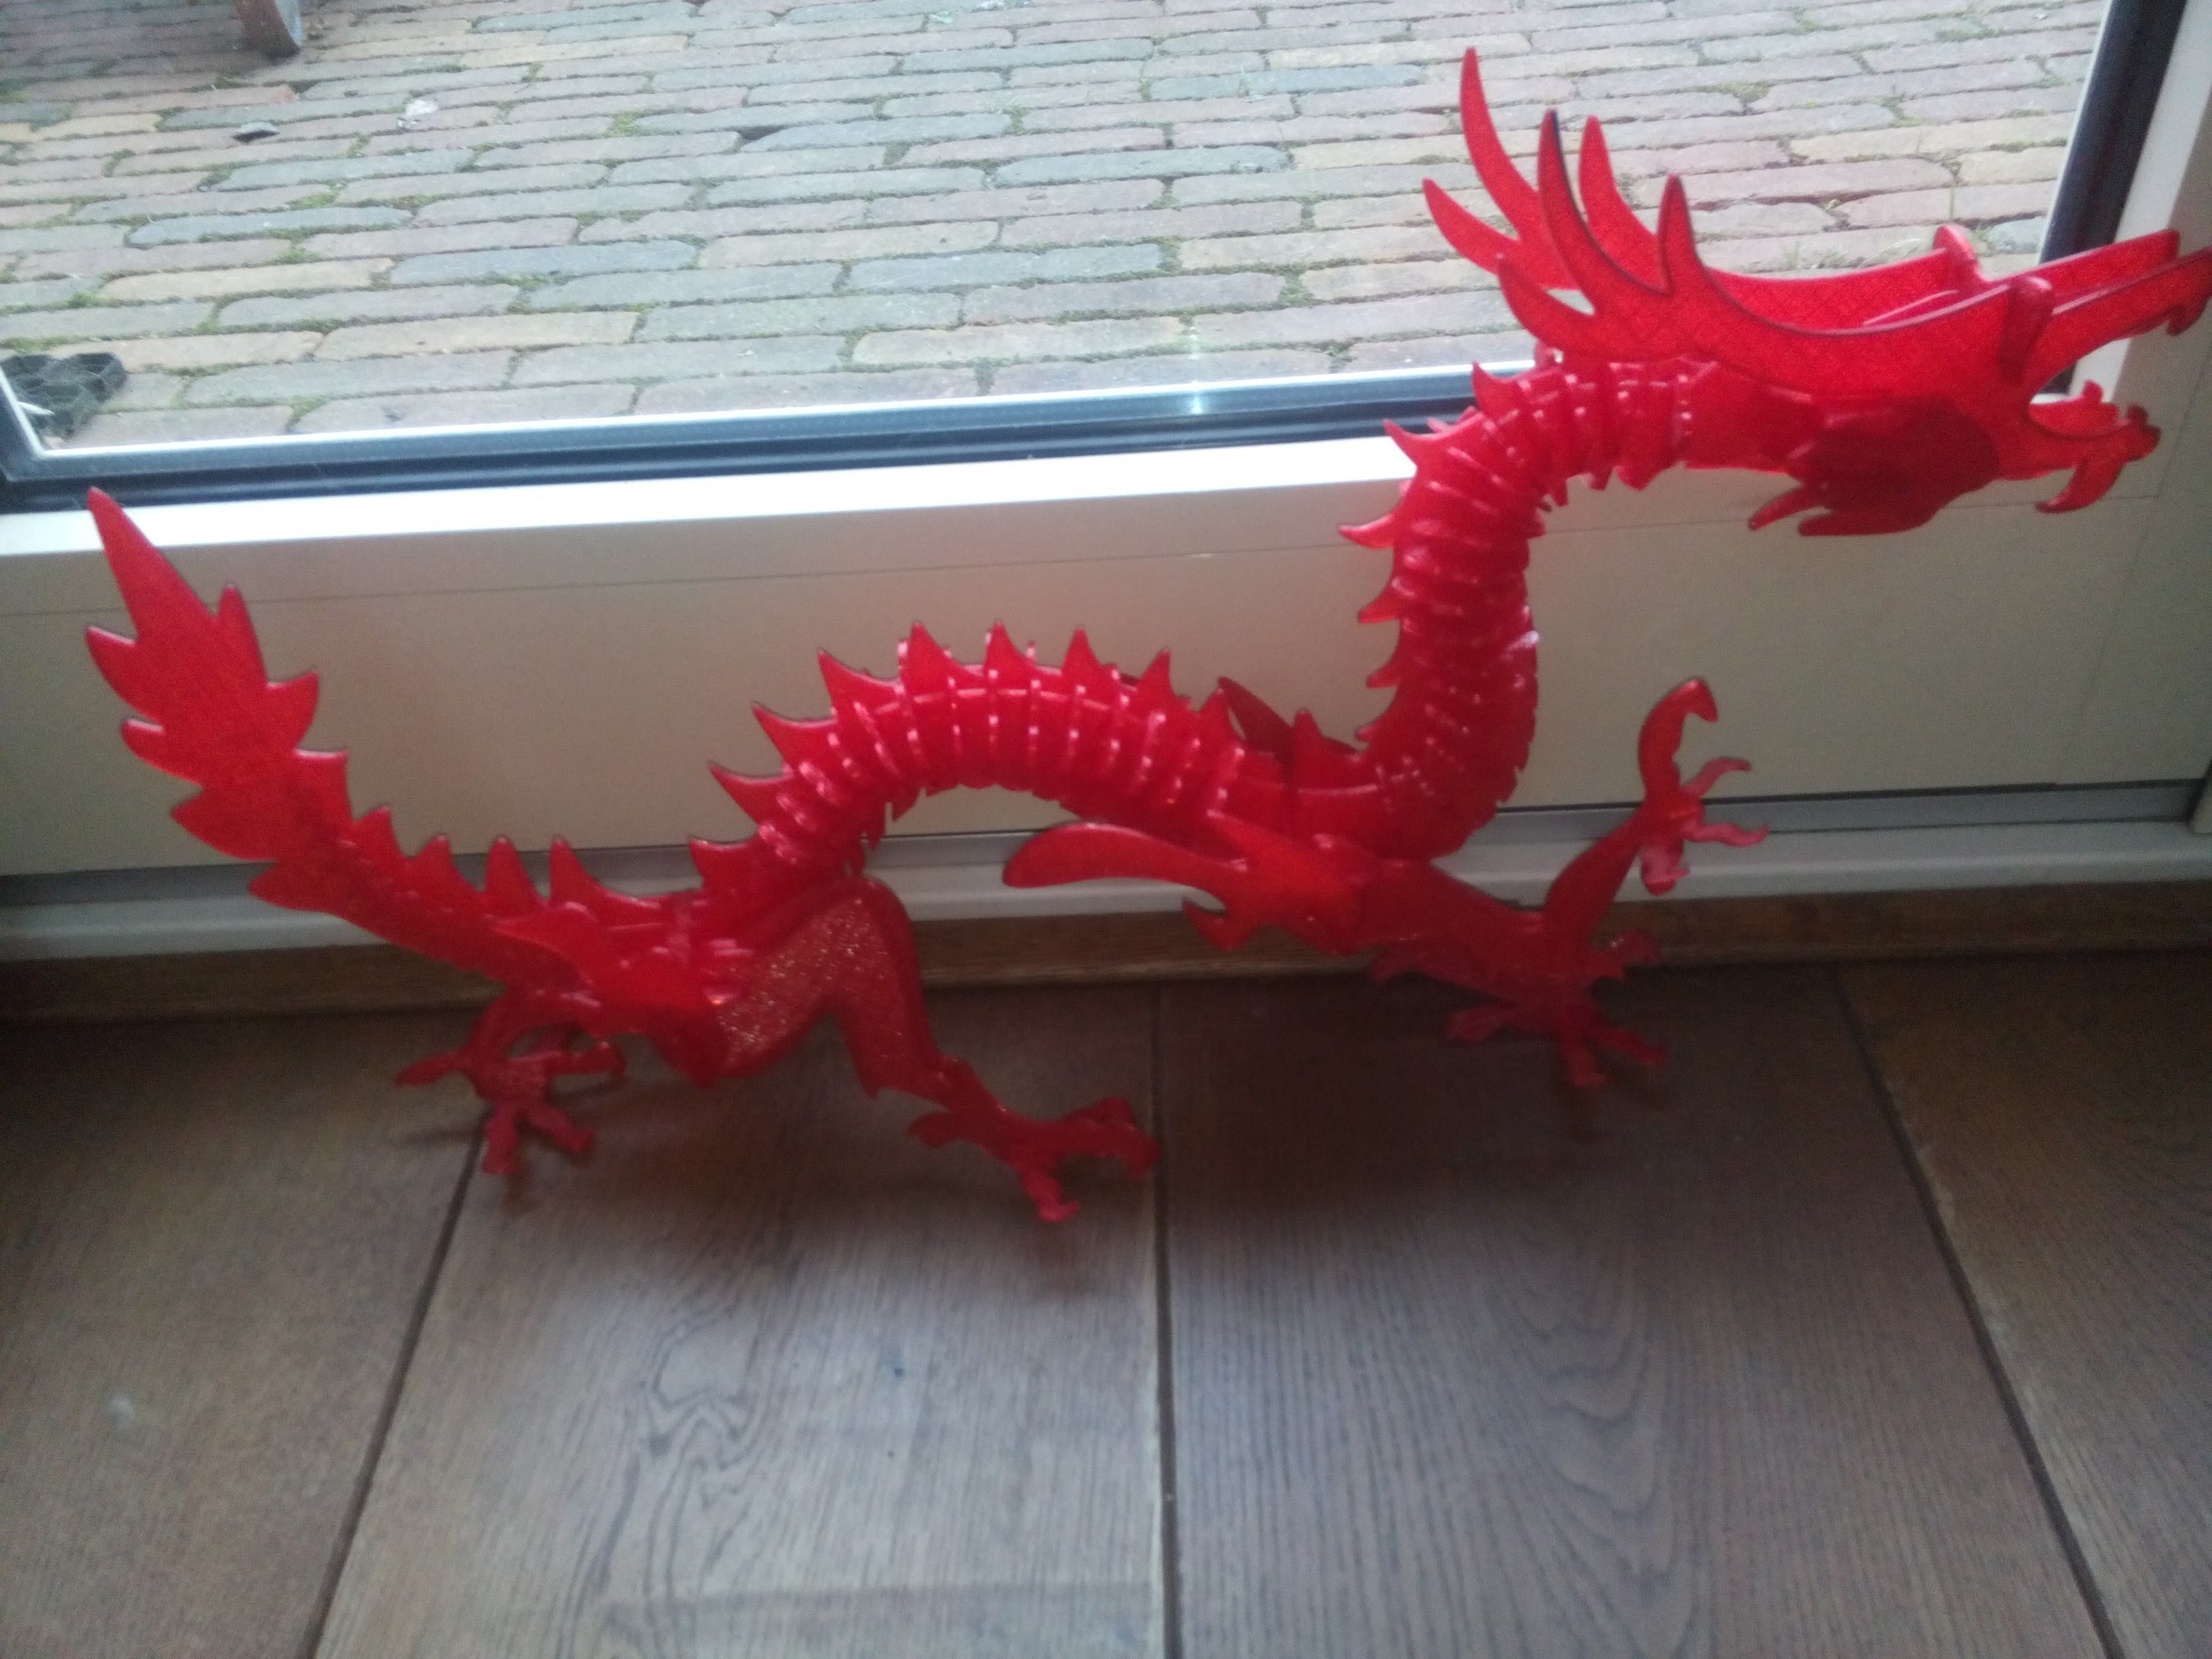 3D Printed 3D Printable Dragon Puzzleels_Meulendijks   Pinshape - Printable Dragon Puzzle